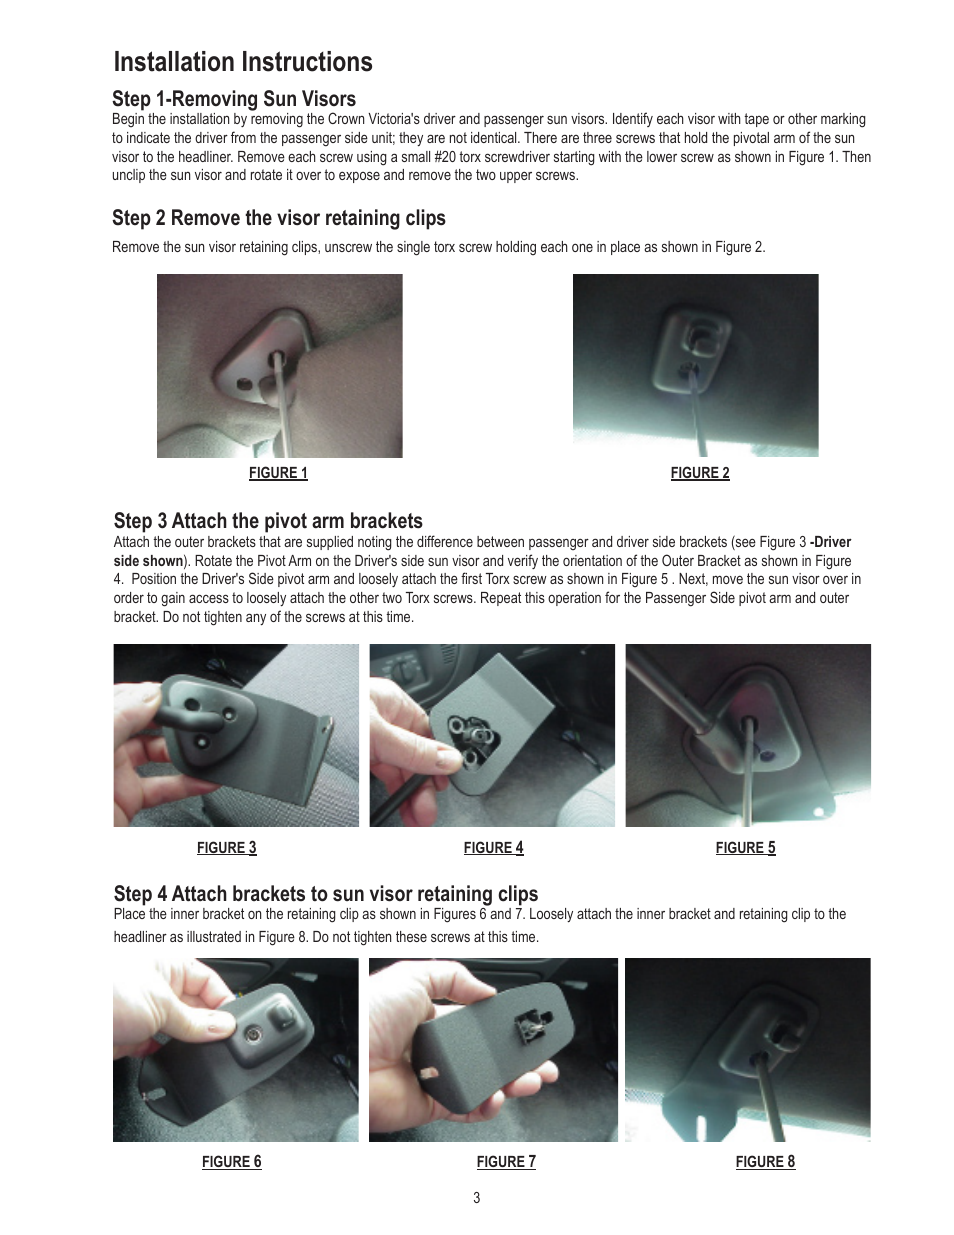 Installation instructions c42609824d9